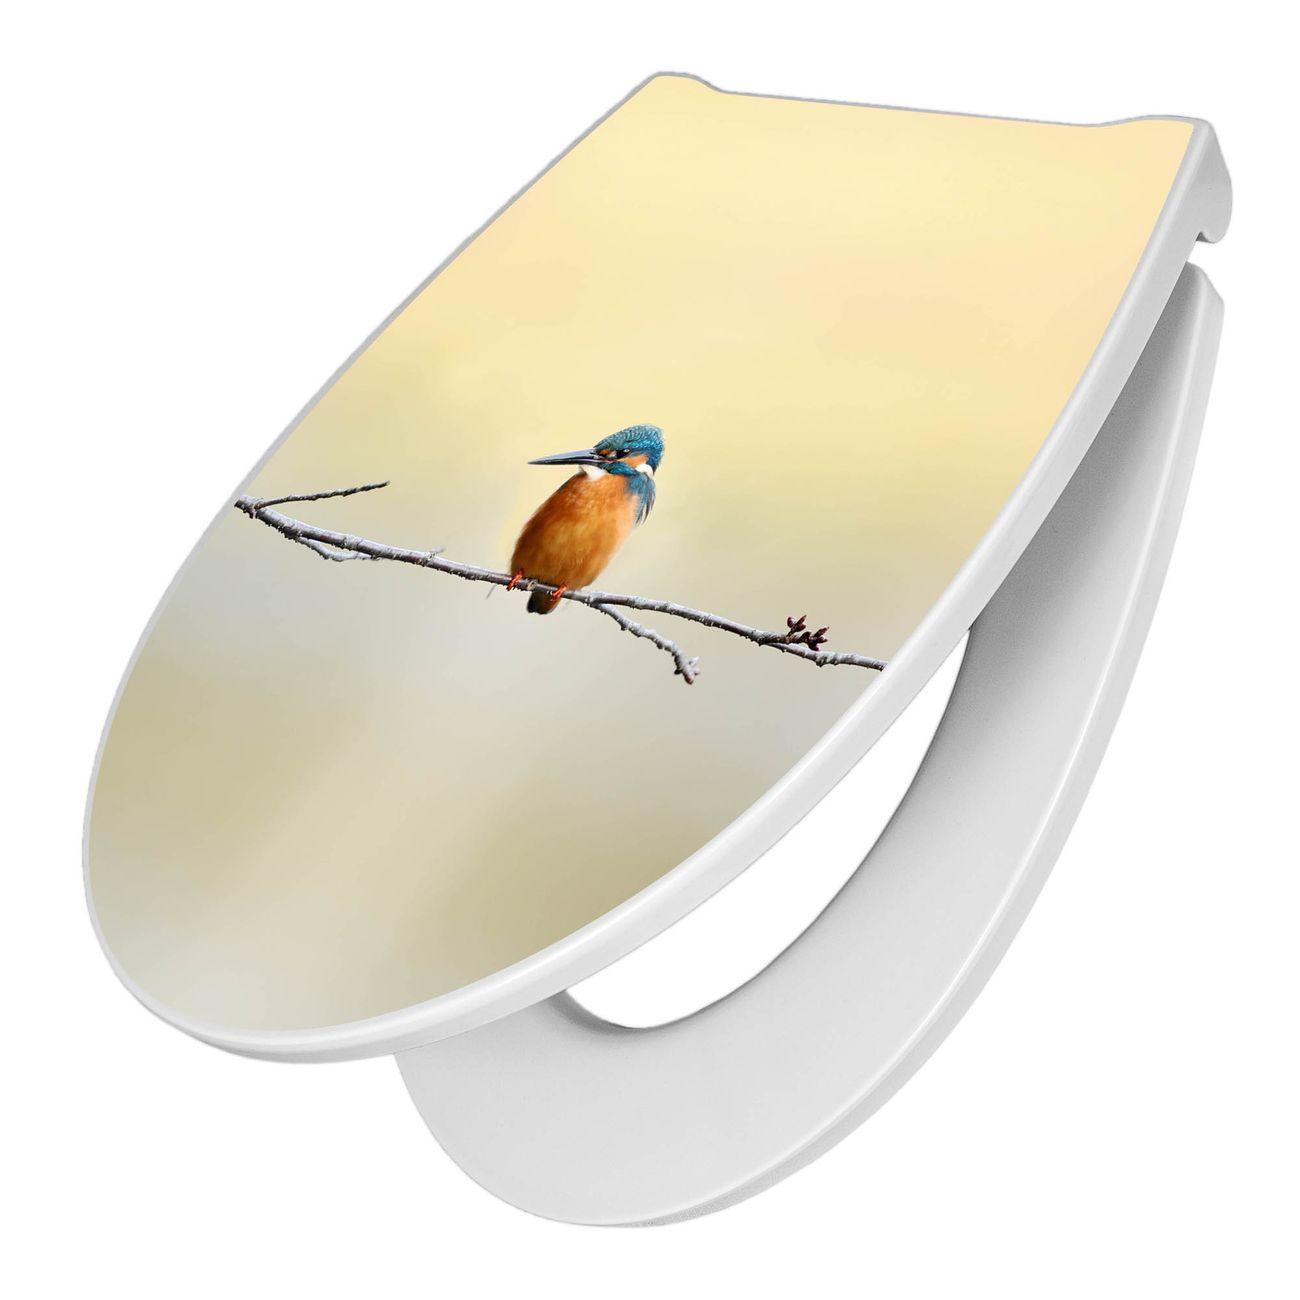 Premium WC-Sitz Softclose Absenkautomatik Motiv Pause